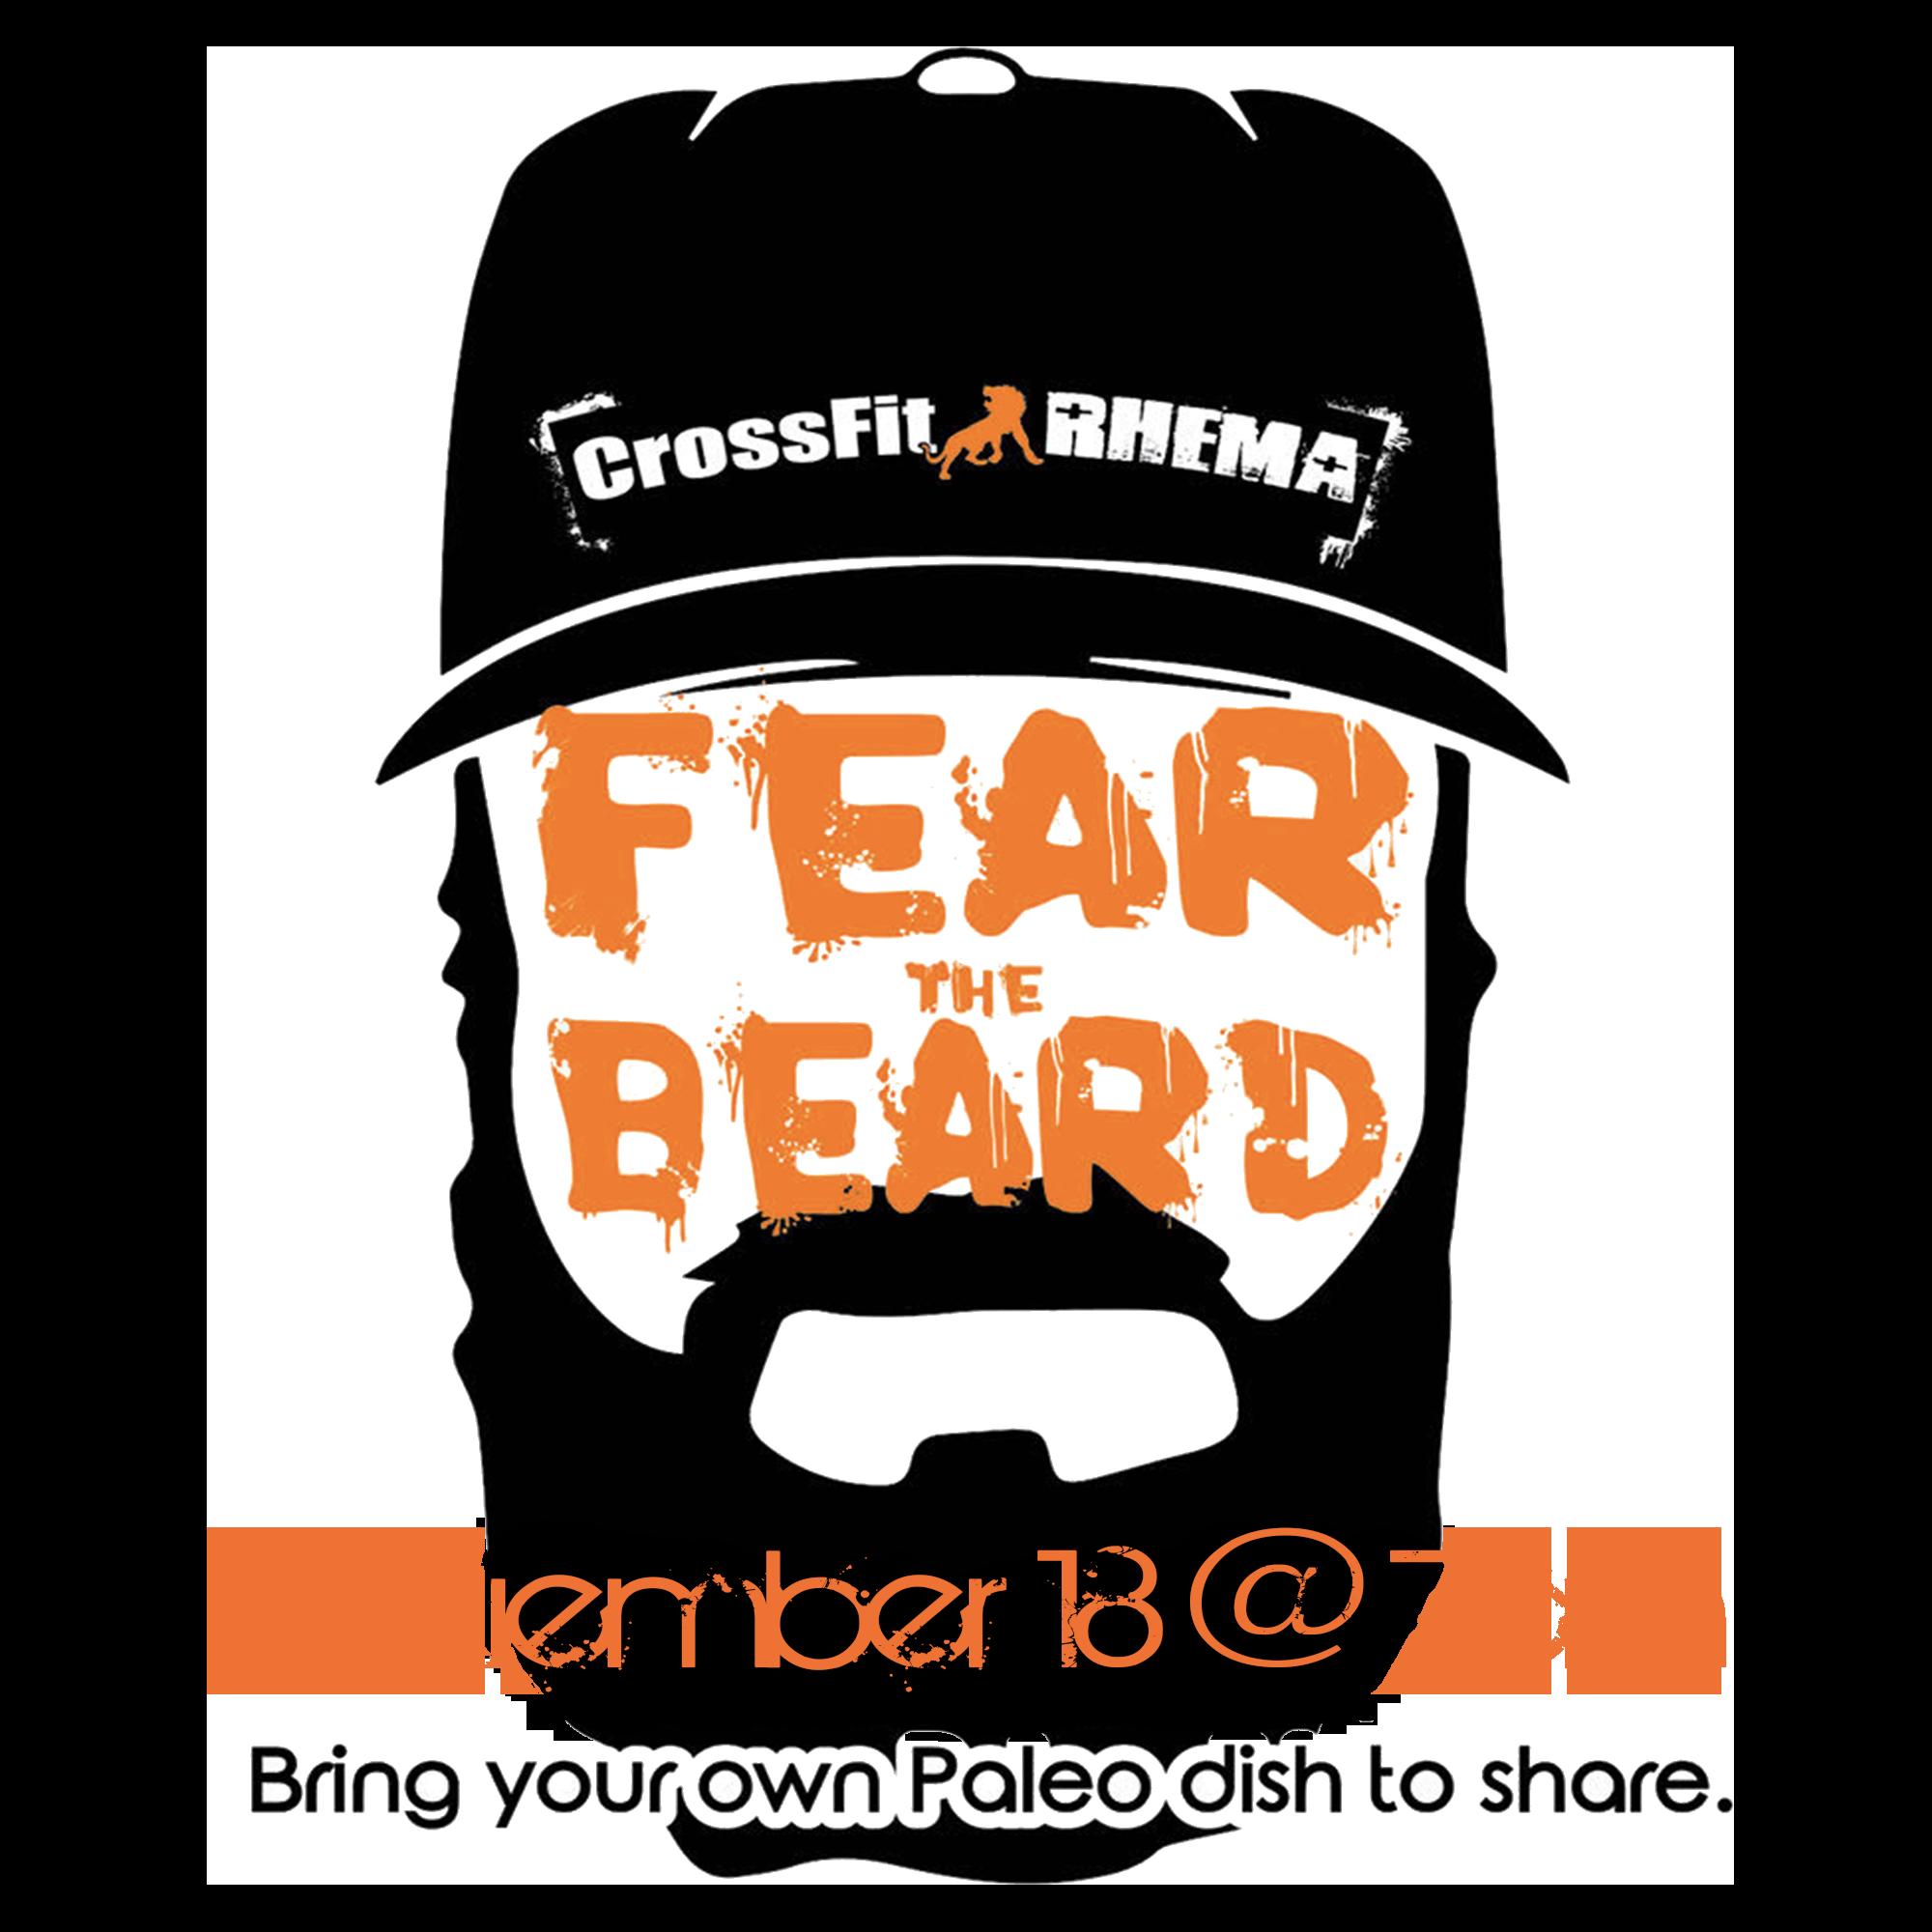 crossfit rhema fear the beard